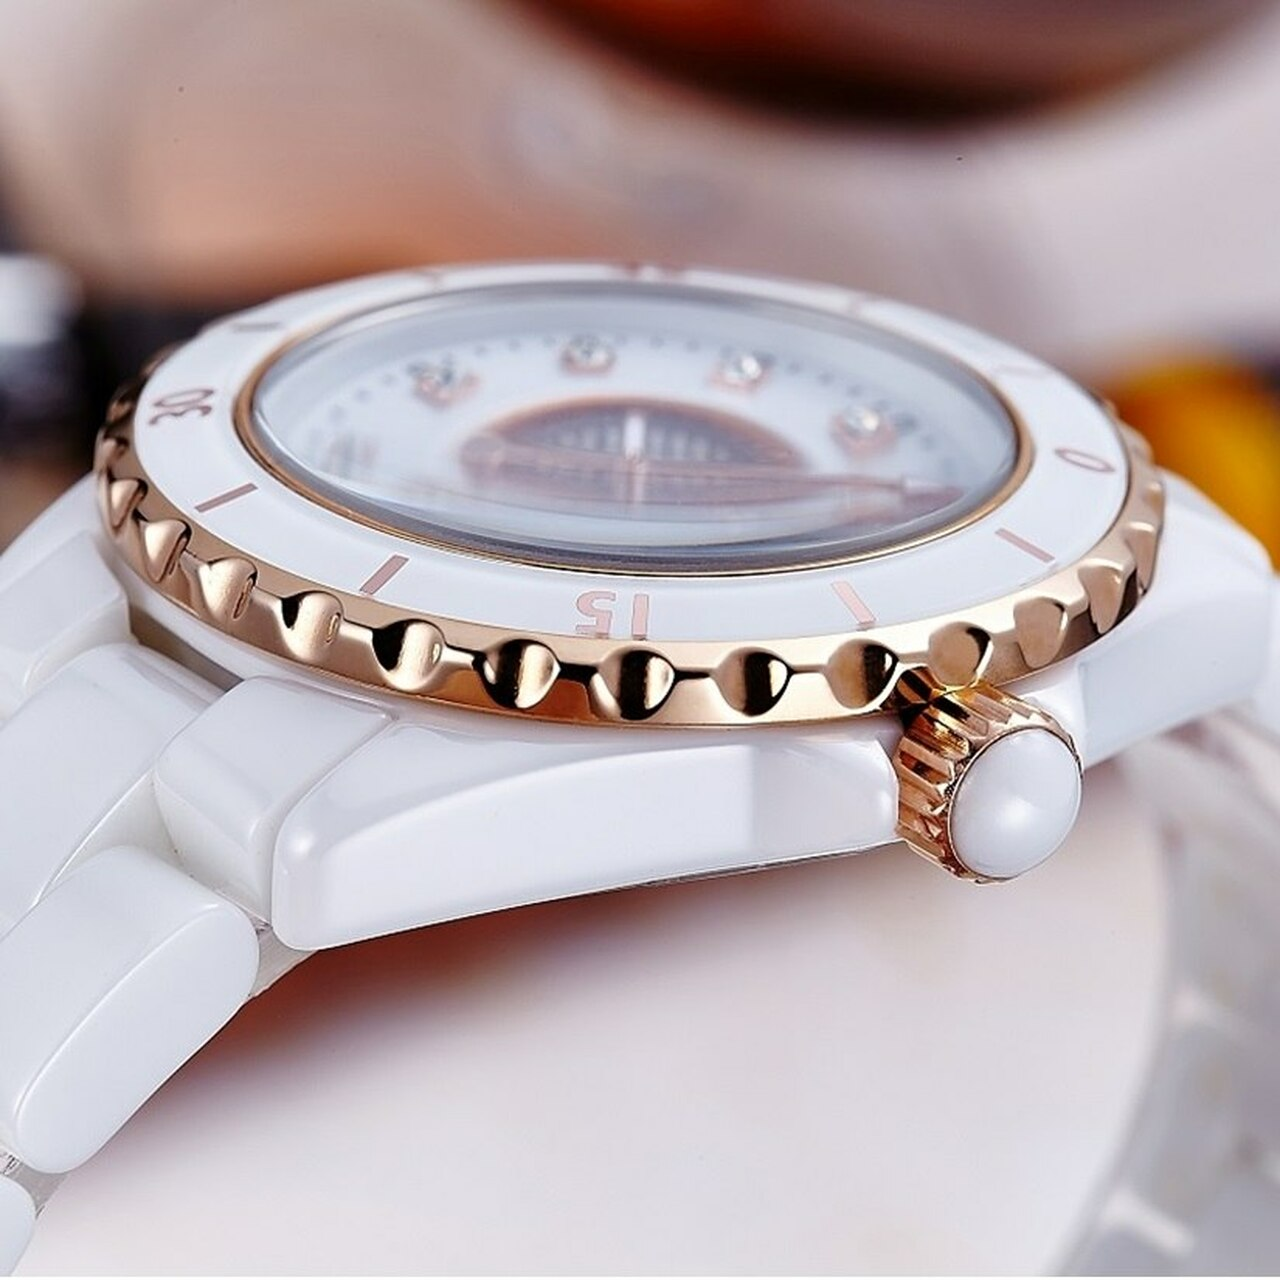 596b47c65 DALISHI Brand Women Quartz Watch Men/Lady Couple Watches Fashion Girl  Bracelet Charm Wristwatch Calendar .